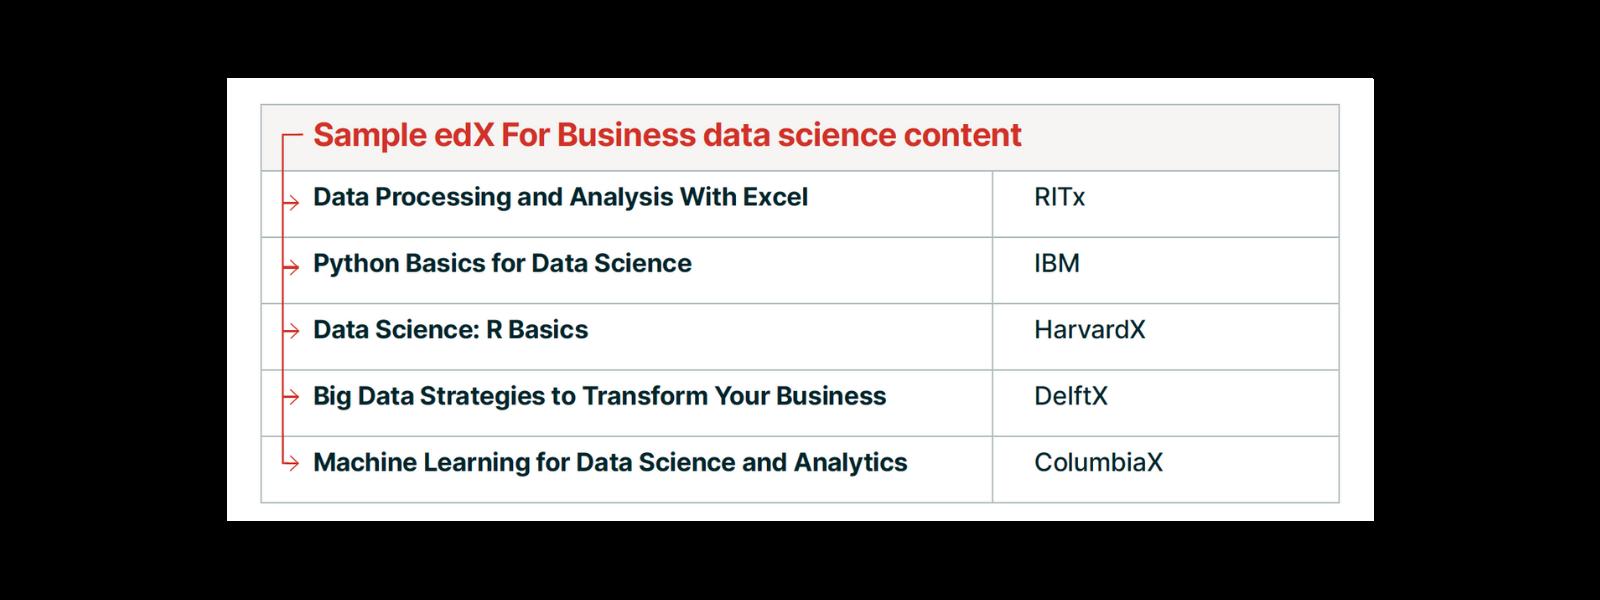 edx-data-science-courses-1